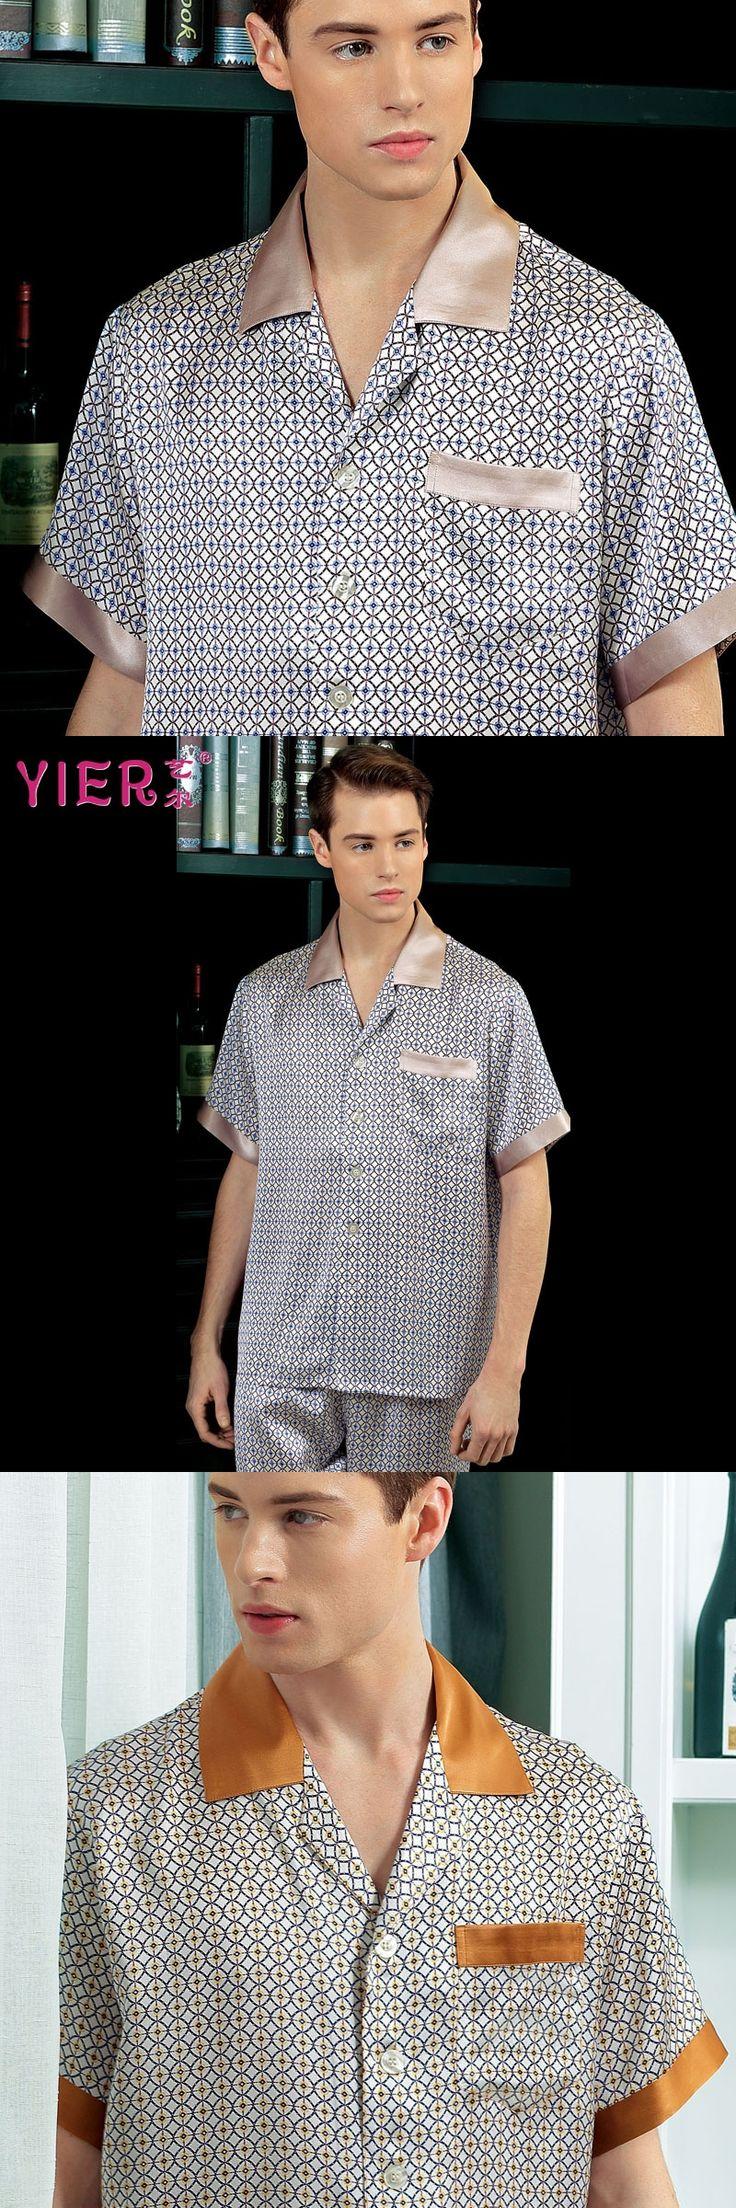 1701 YIER Brand Summer 100% Silk Pajama Sets Men Short Sleeves luxury Noble Sexy Male Sleepwear Pijamas Free Shipping